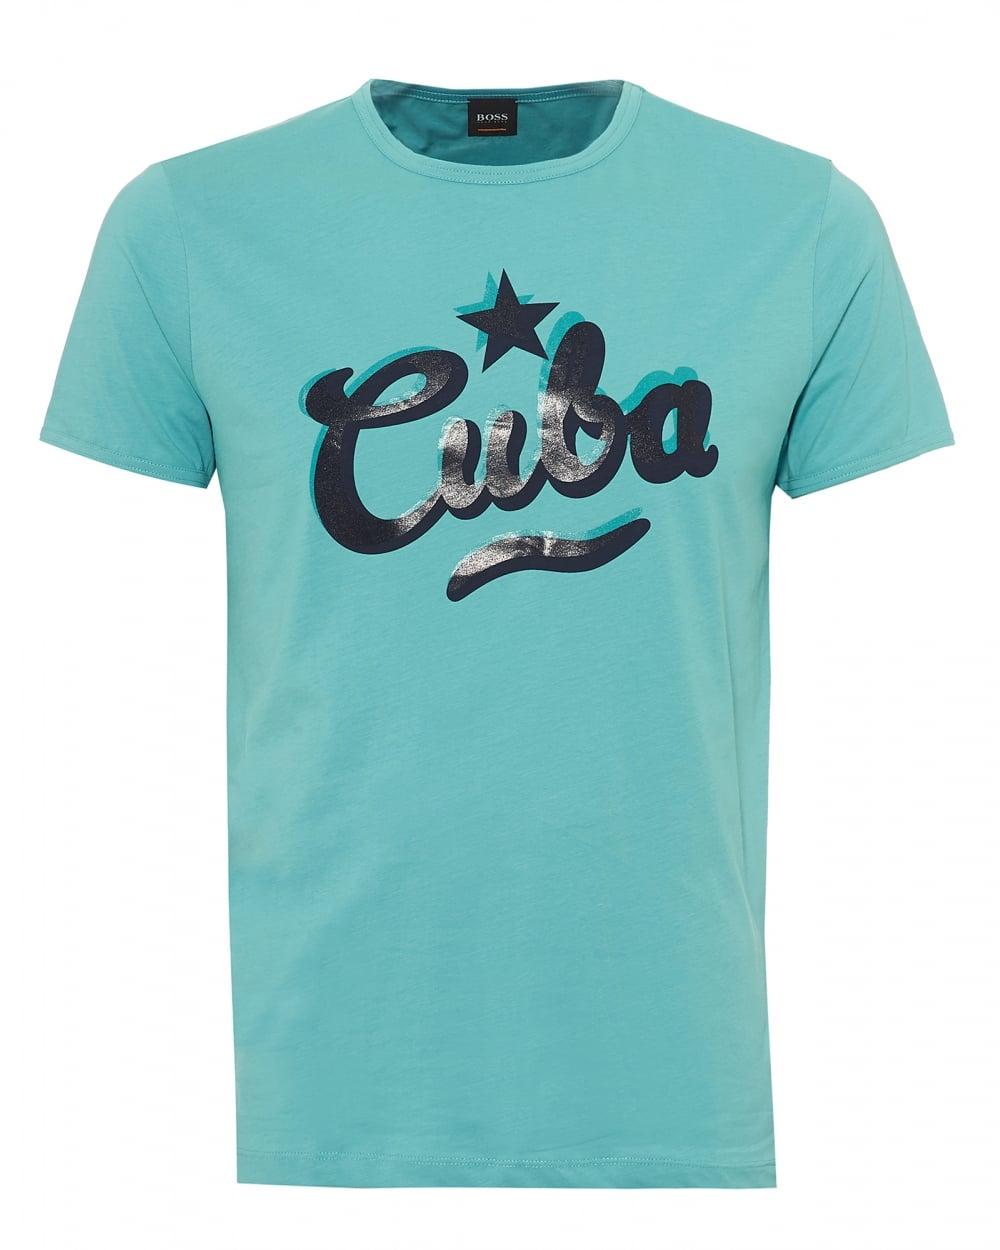 c7fd97cd1 Hugo Boss Orange Mens Tauno 5 T-Shirt, Cuba Graphic Aqua Blue Tee